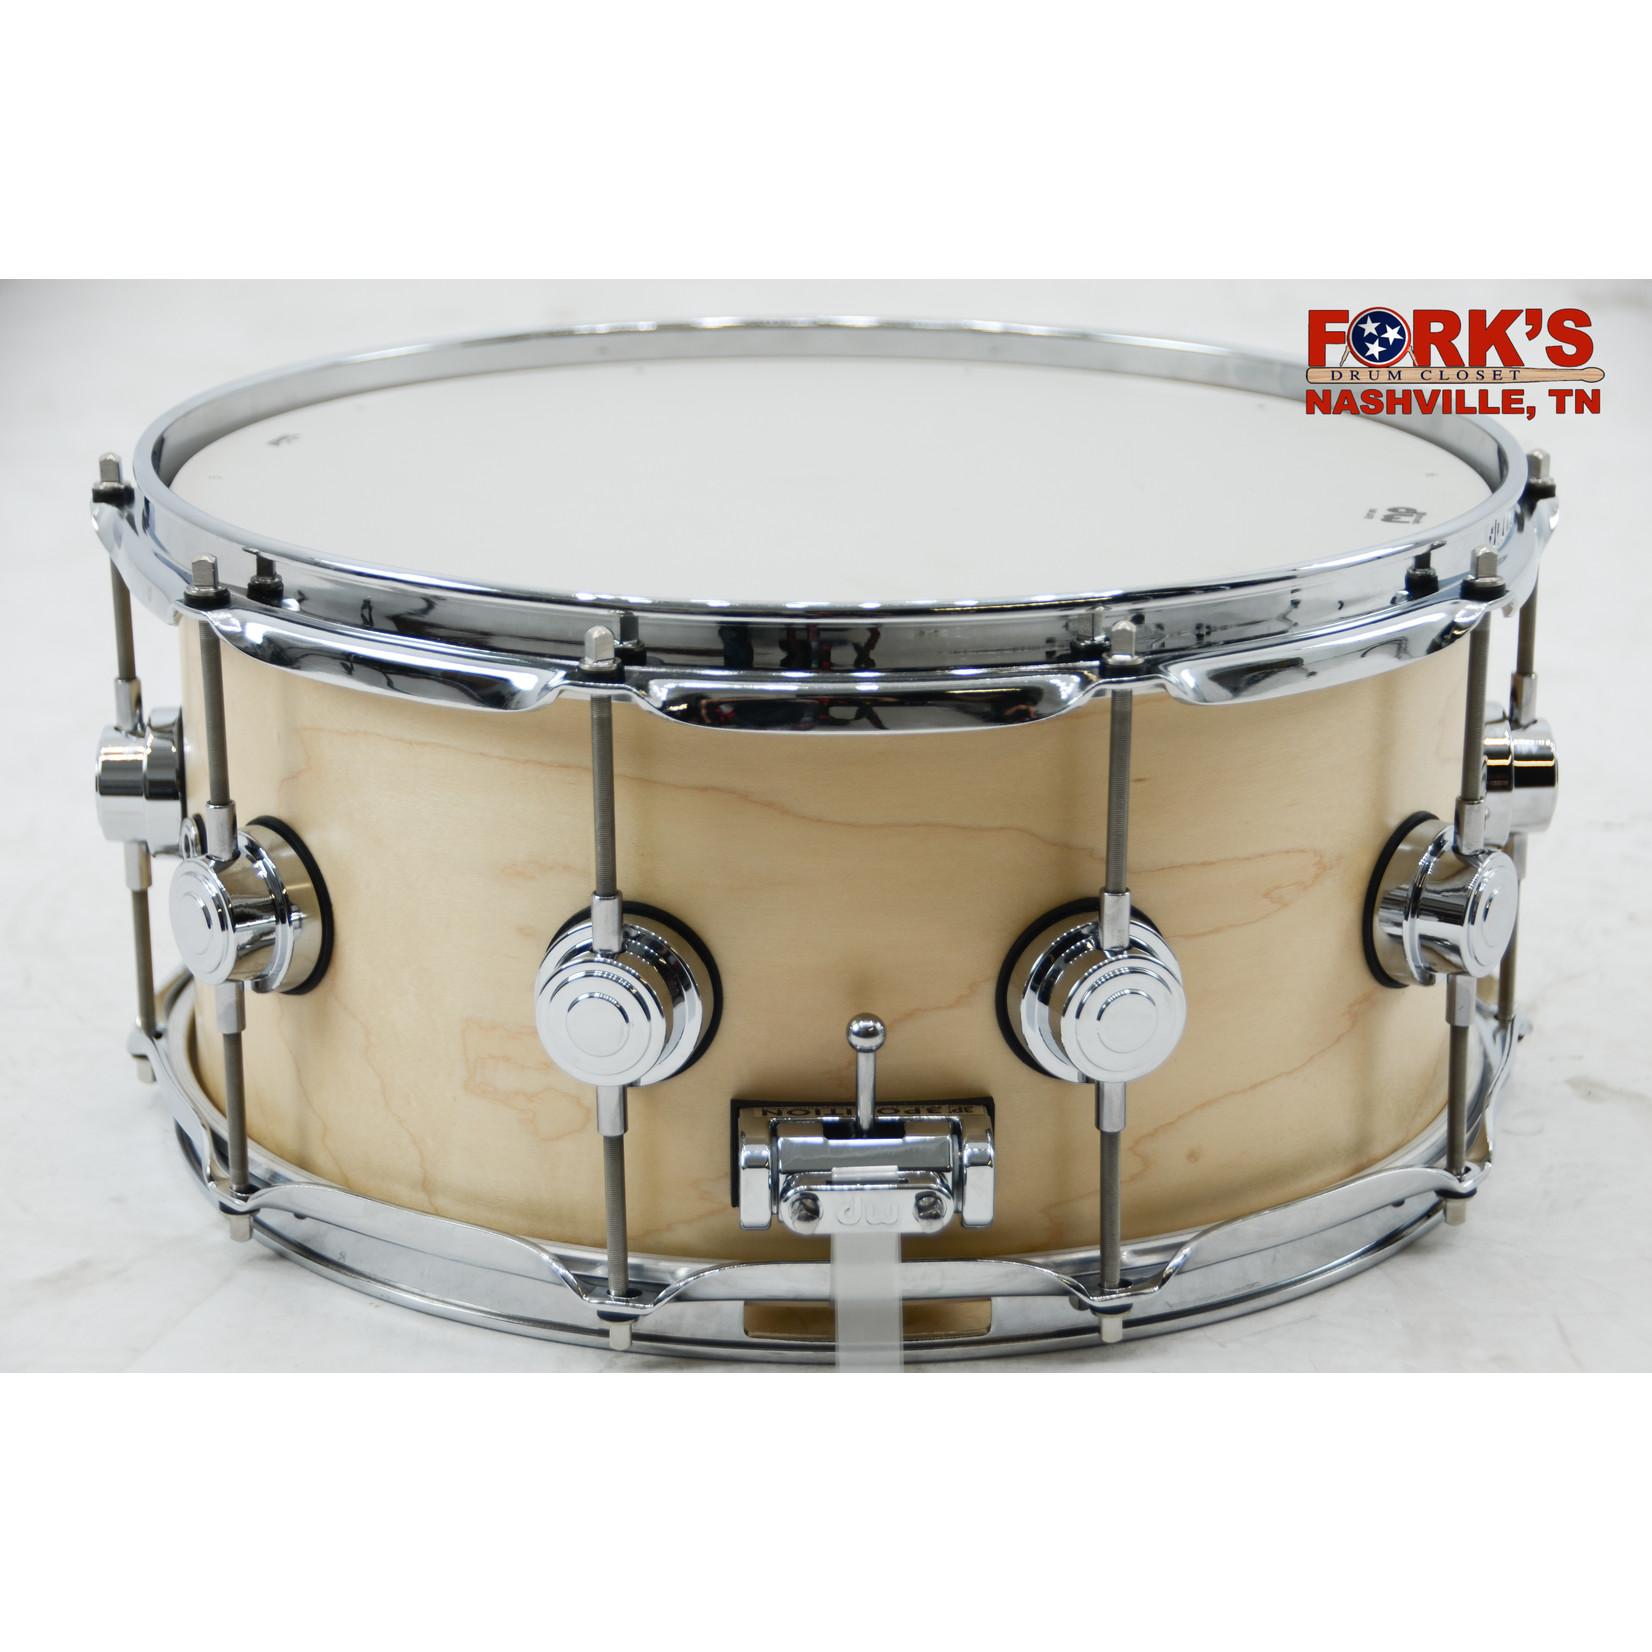 "DW DW Collectors Maple 6.5x14 Snare Drum ""Satin Natural"""